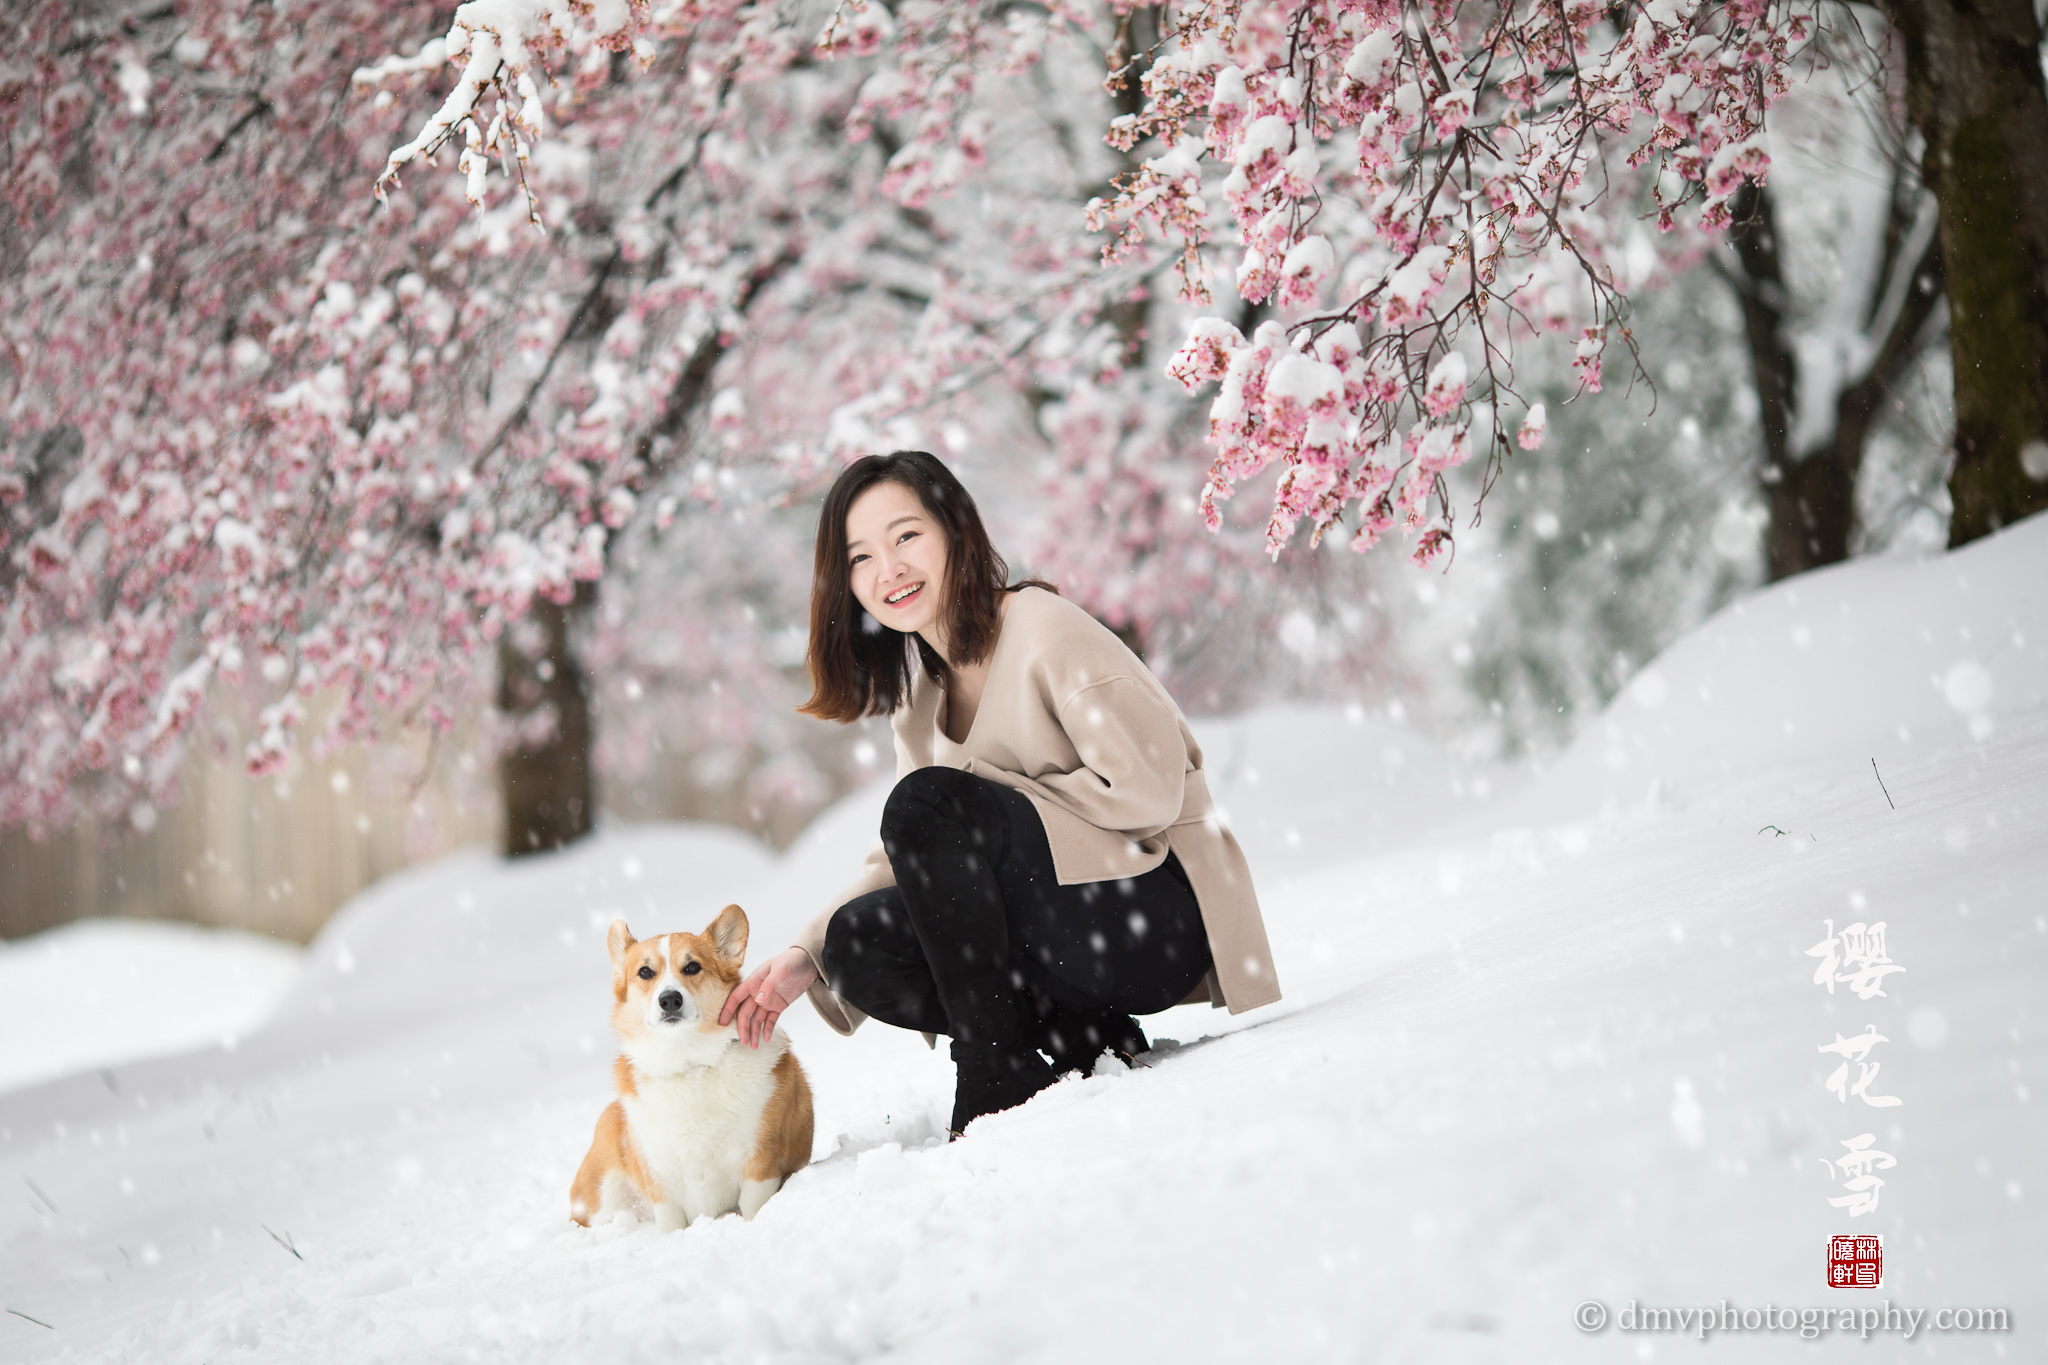 _D4_8289-snow